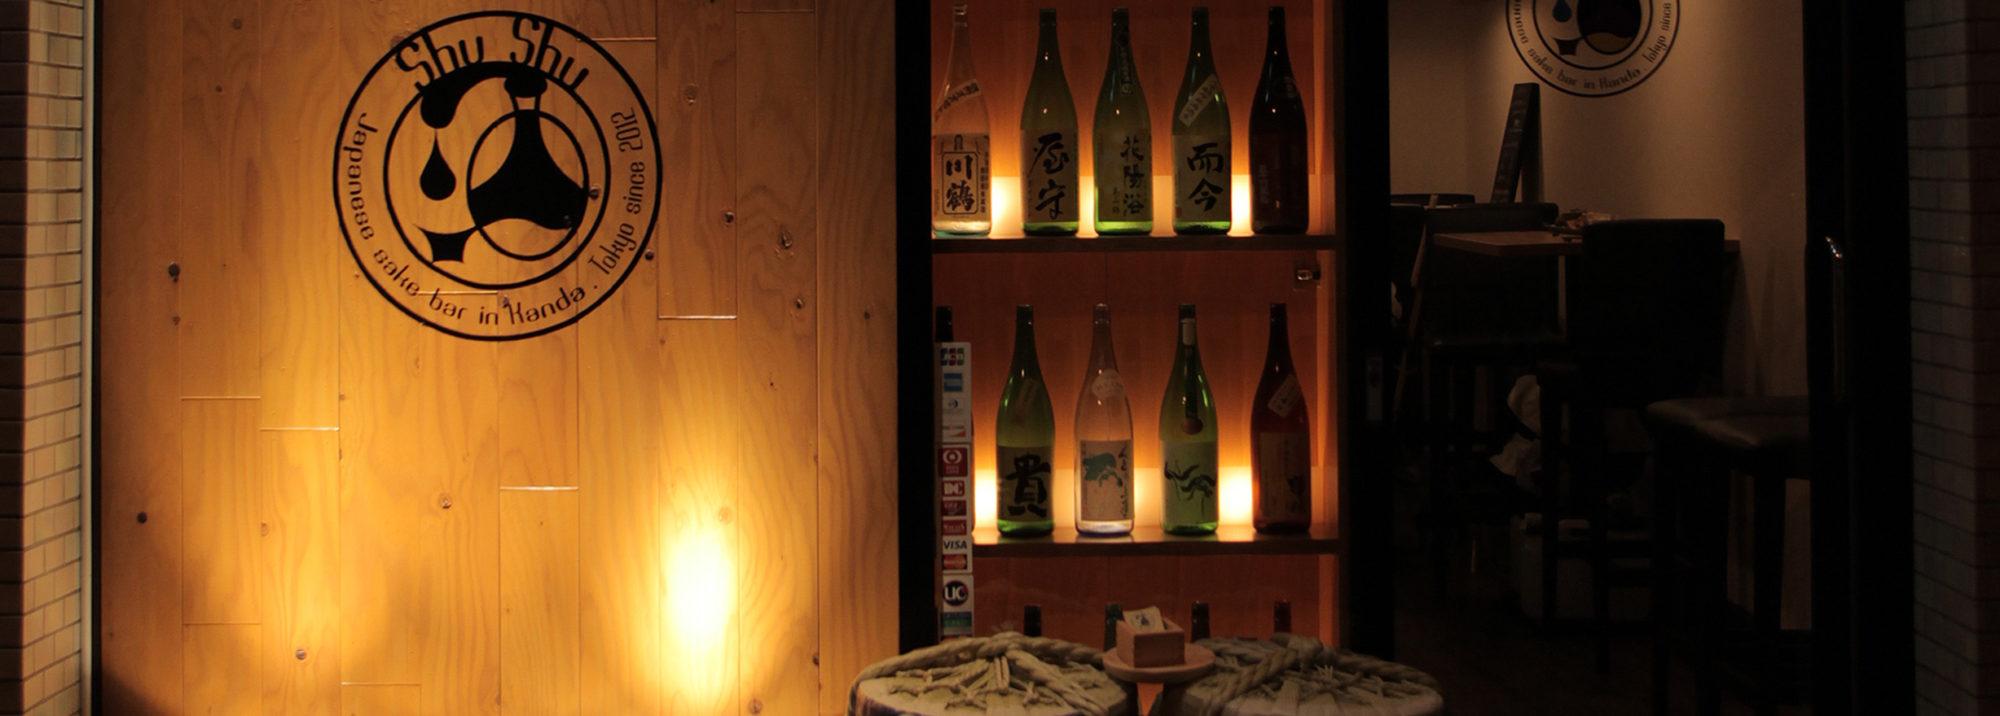 神田   日本酒バル 酒趣 -Shu Shu-